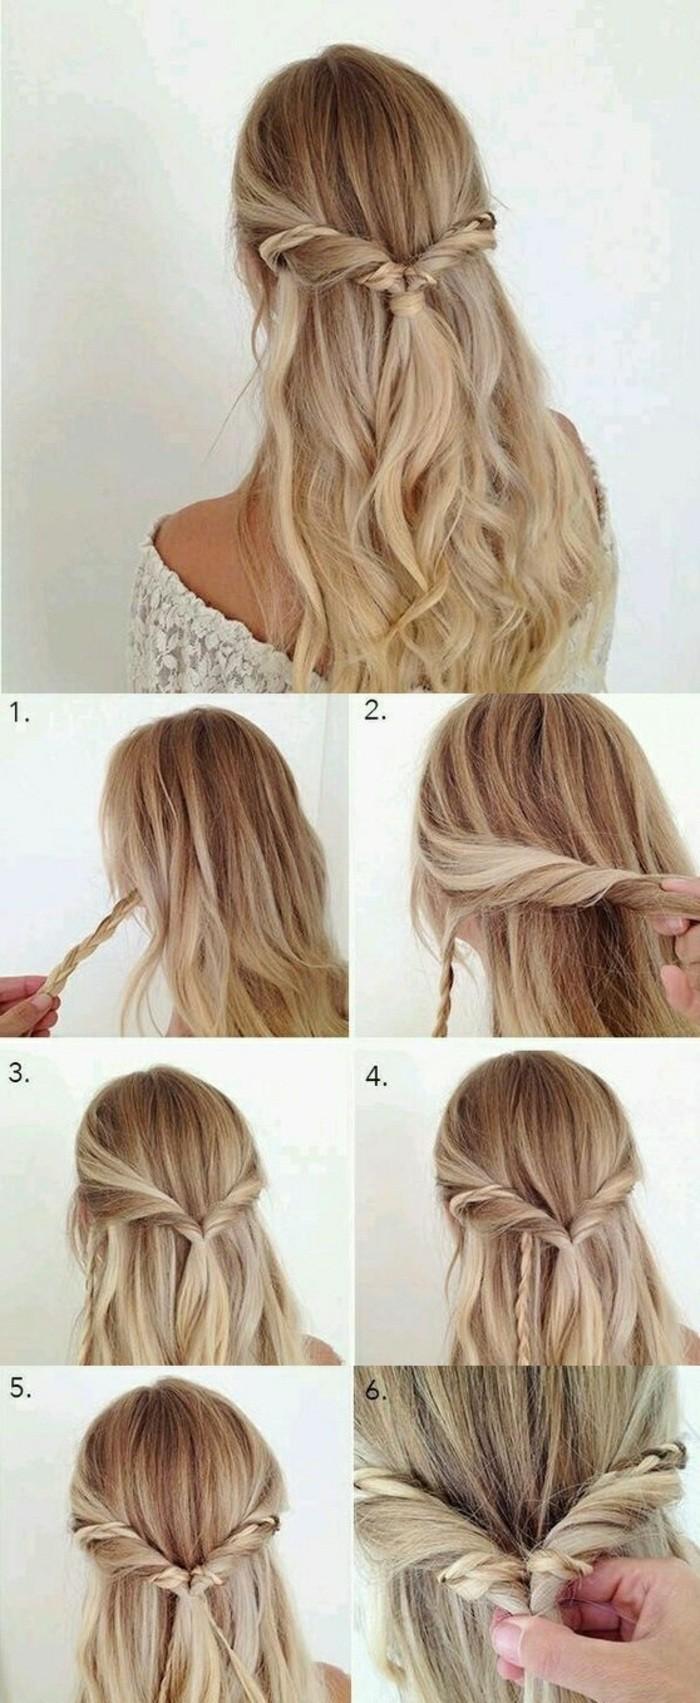 semirecogidos bonitos y elegantes paso a paso, ideas de peinados cabello largo, semirecogido pelo ondulado